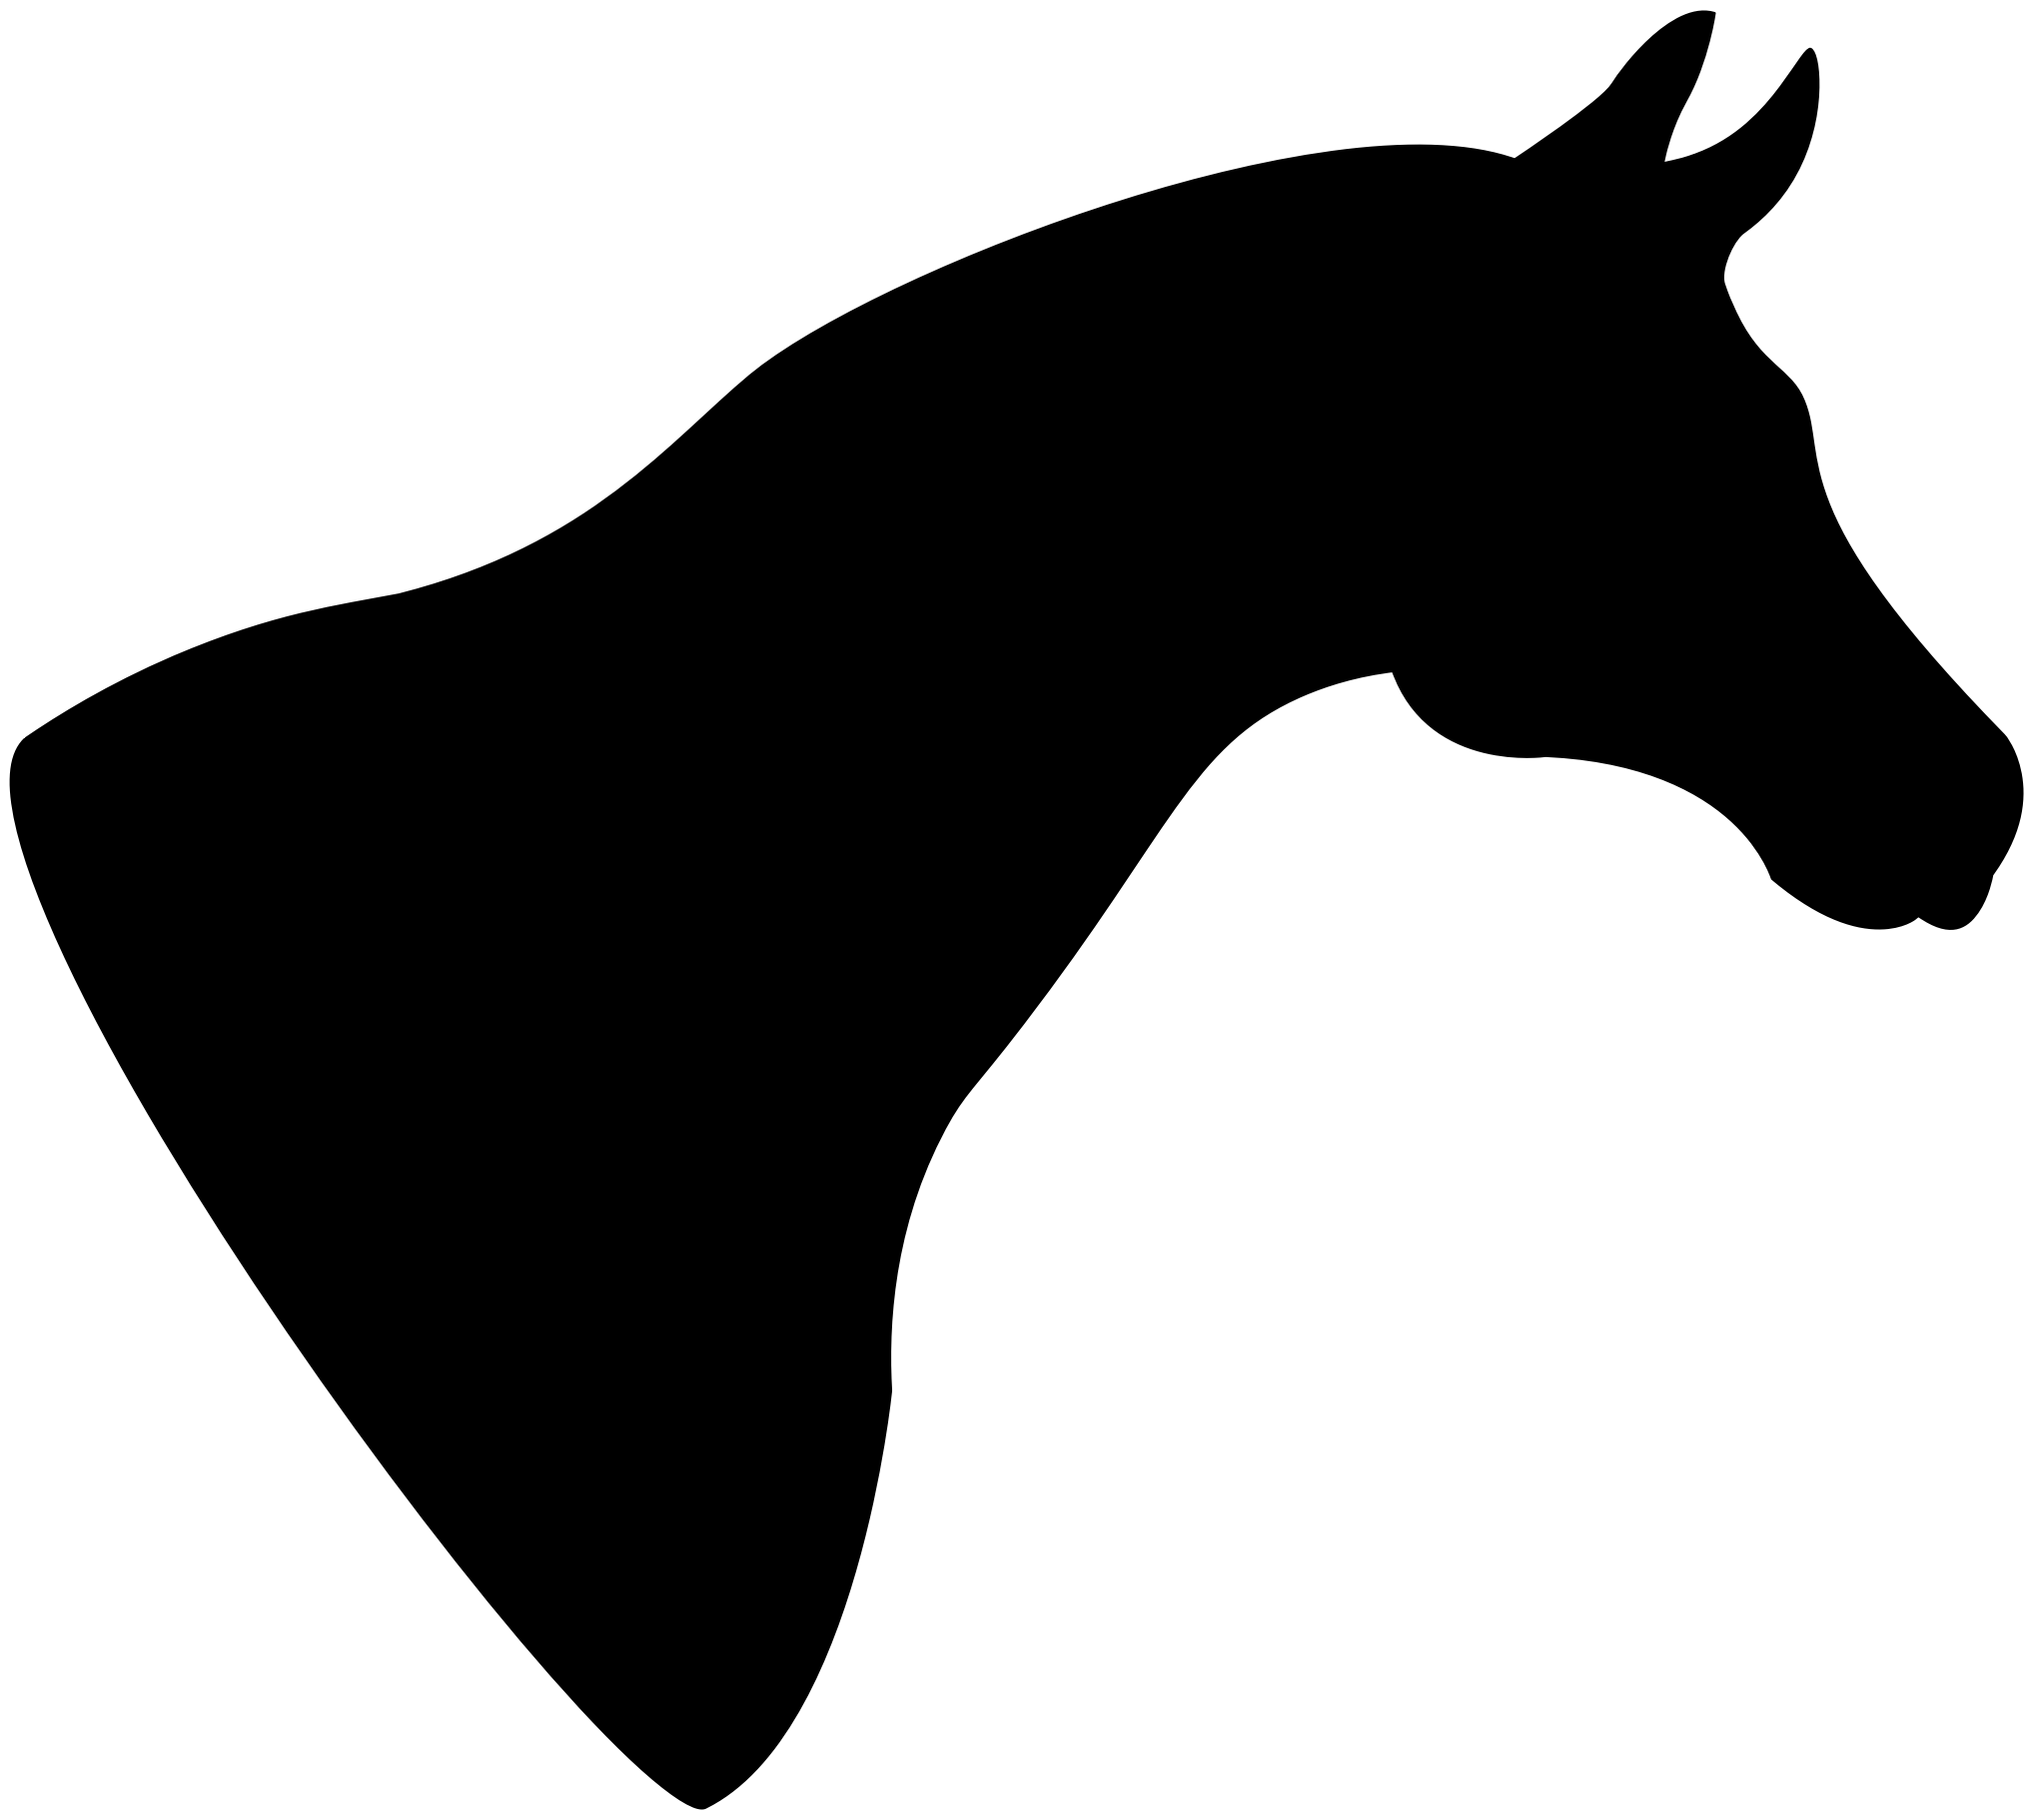 Big Image (Png) - Horse Head, Transparent background PNG HD thumbnail